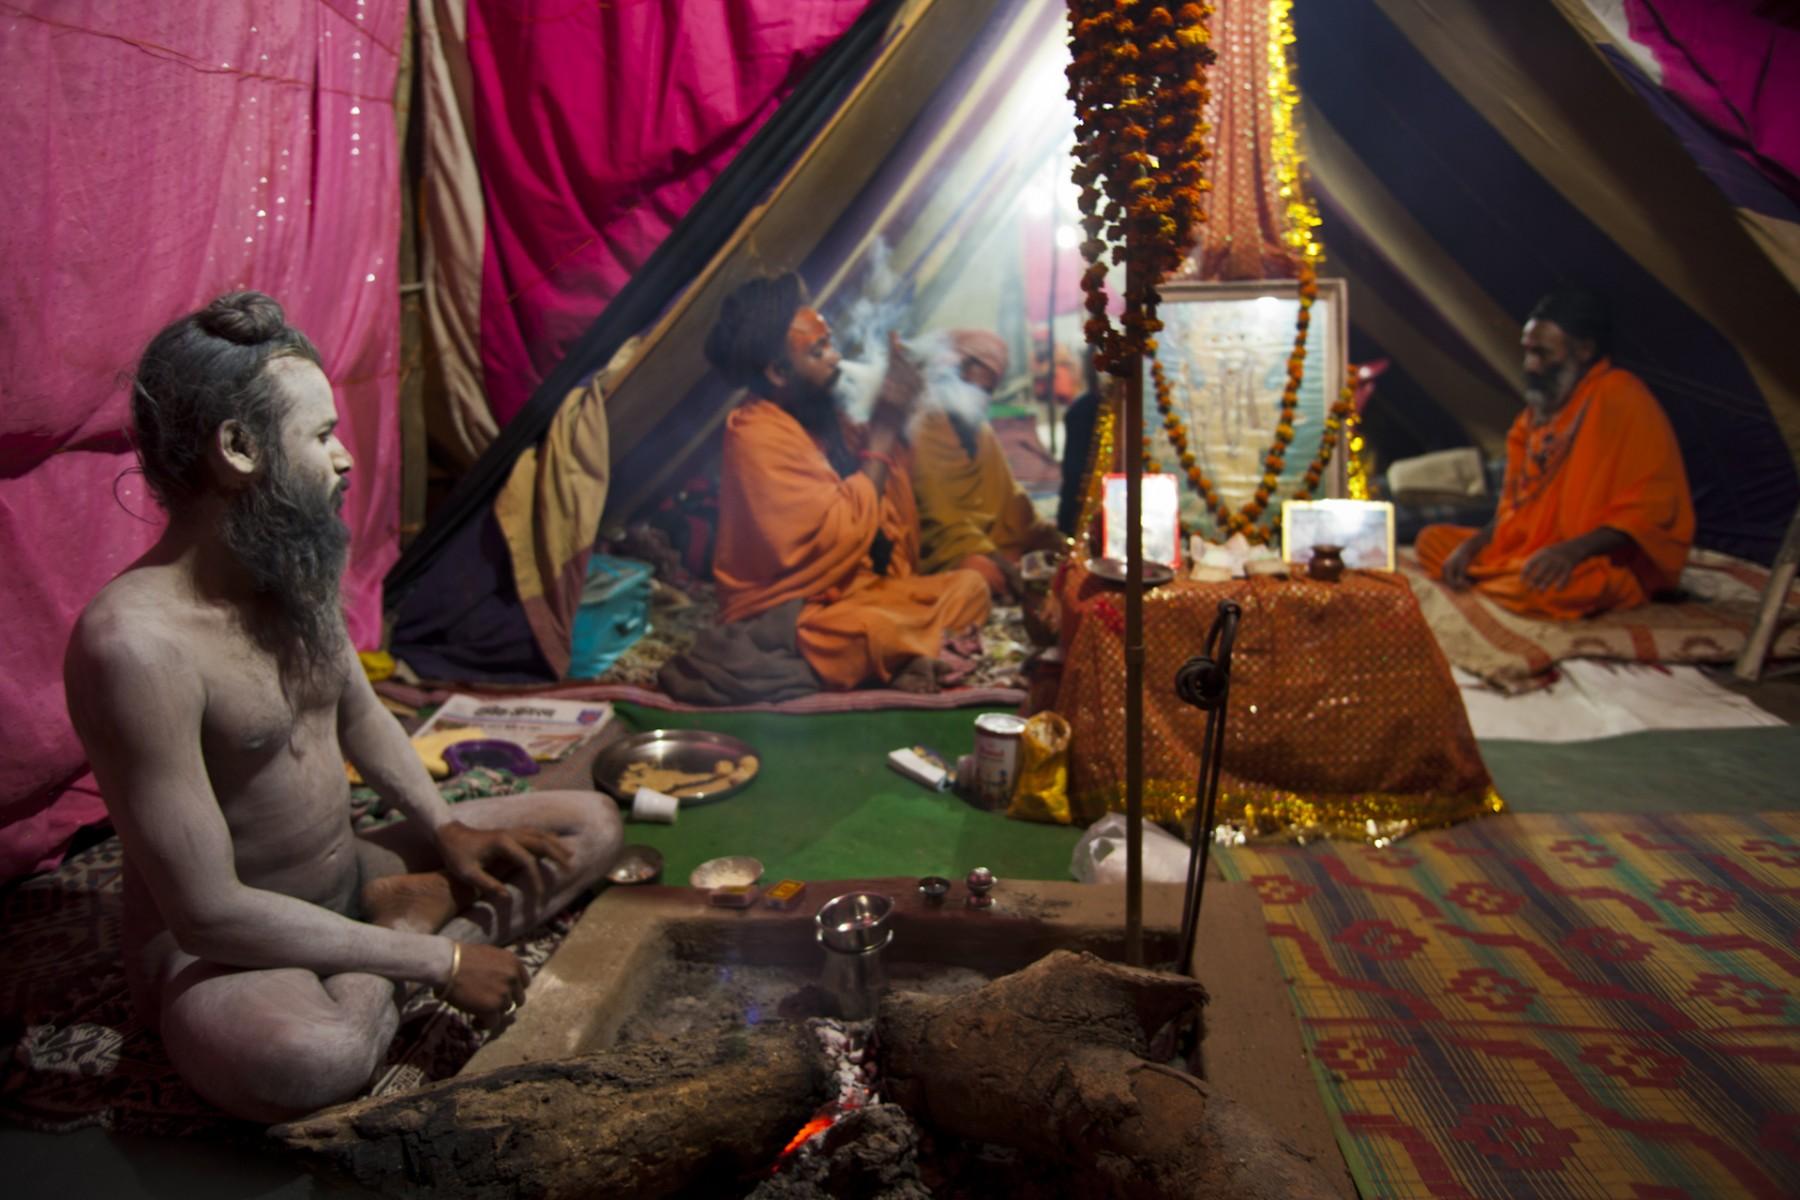 Brightly Coloured Tent, Kumbh Mela, Hardwar